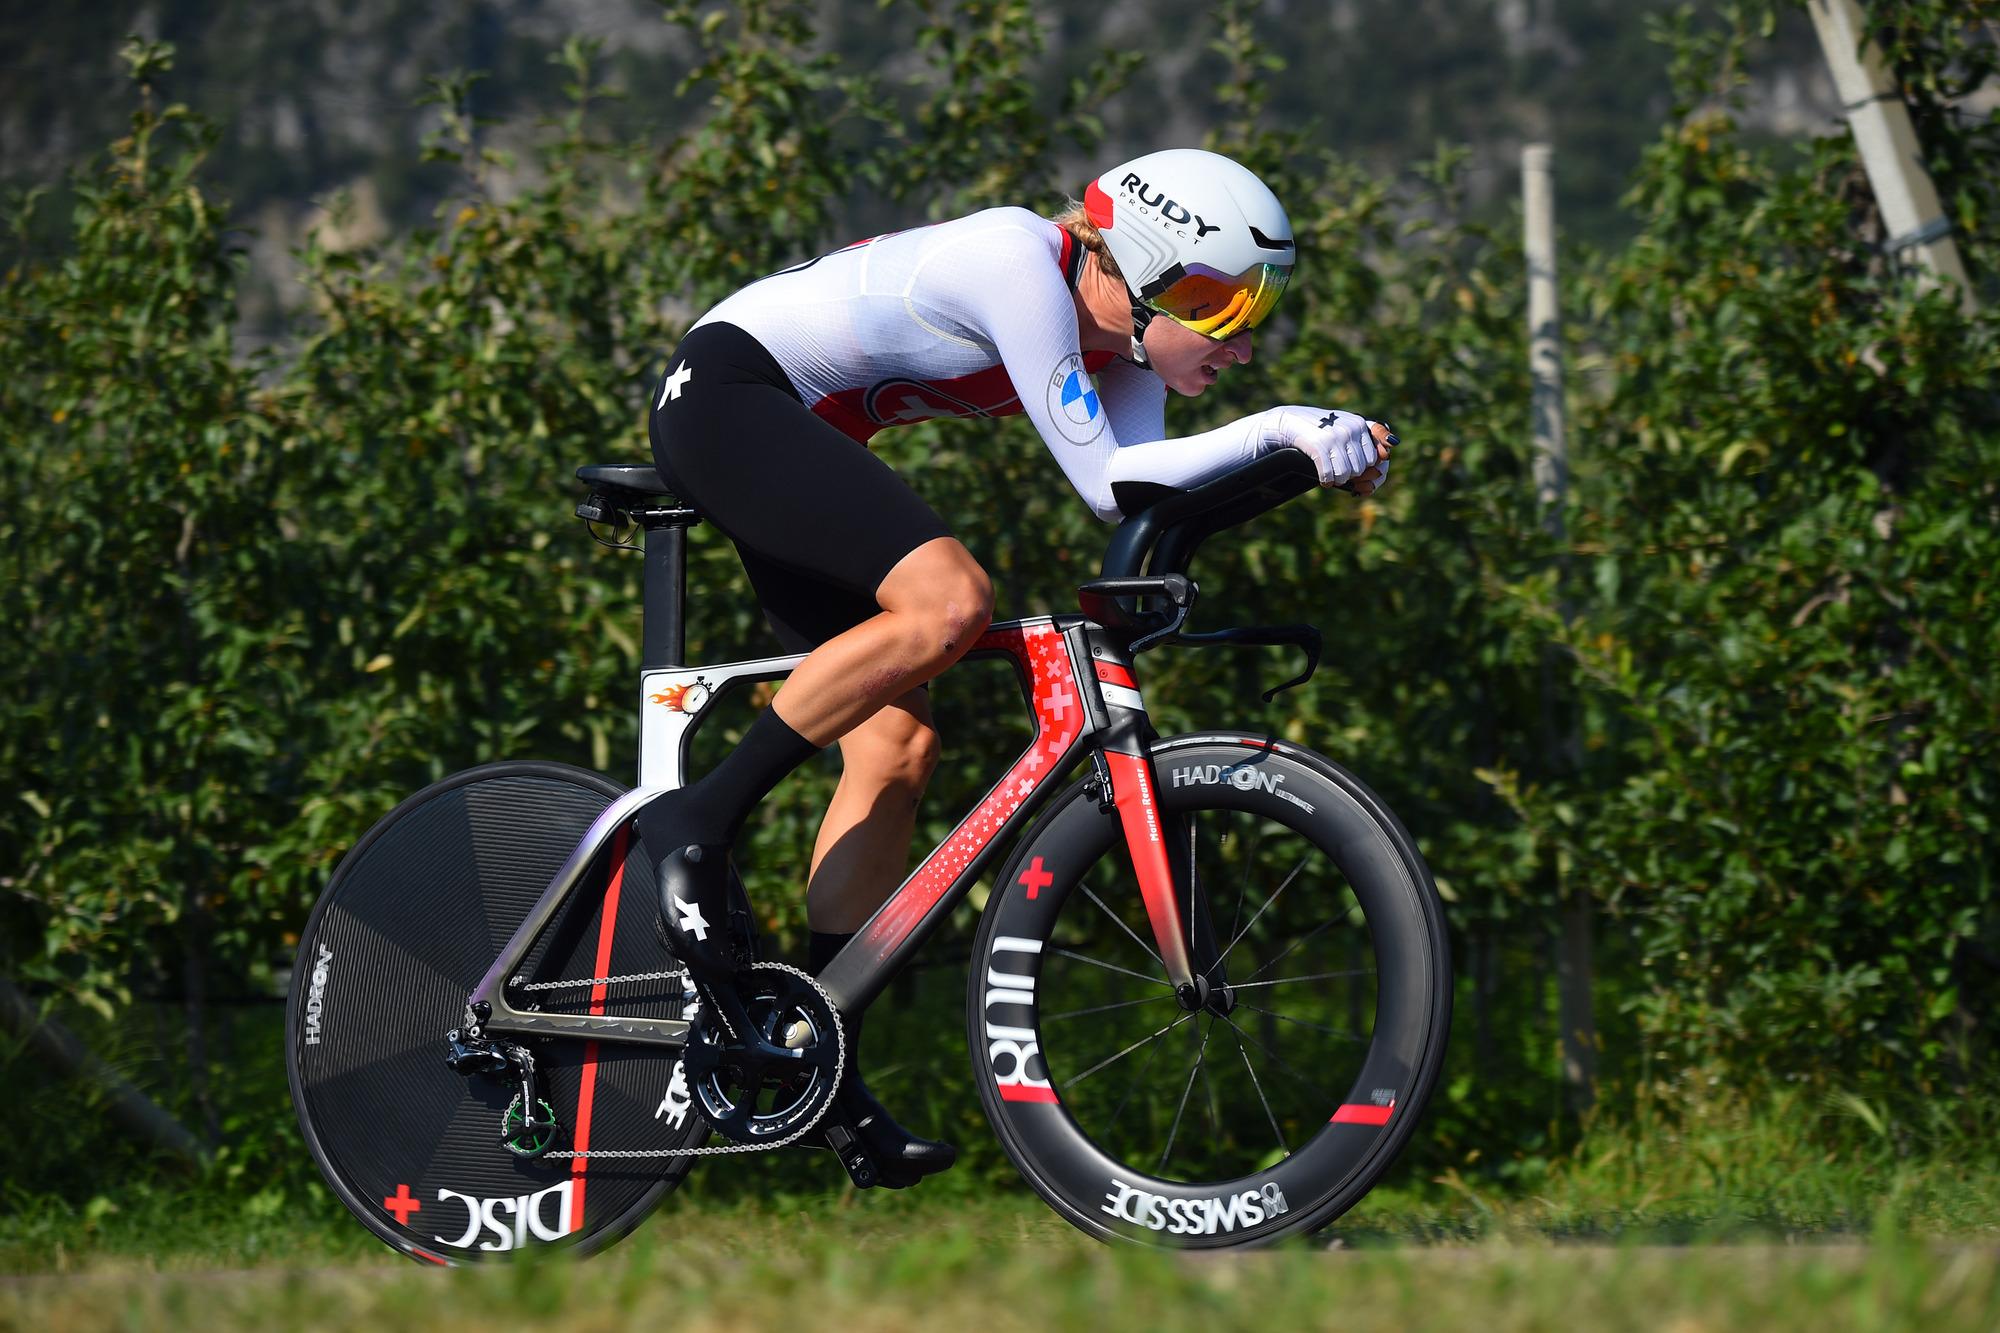 2021 UEC Road European Championships Trento Elite Womens Individual Time Trial 224 km 09092021 Mareln Reussen Switzerland photo Dario BelingheriBettiniPhoto2021